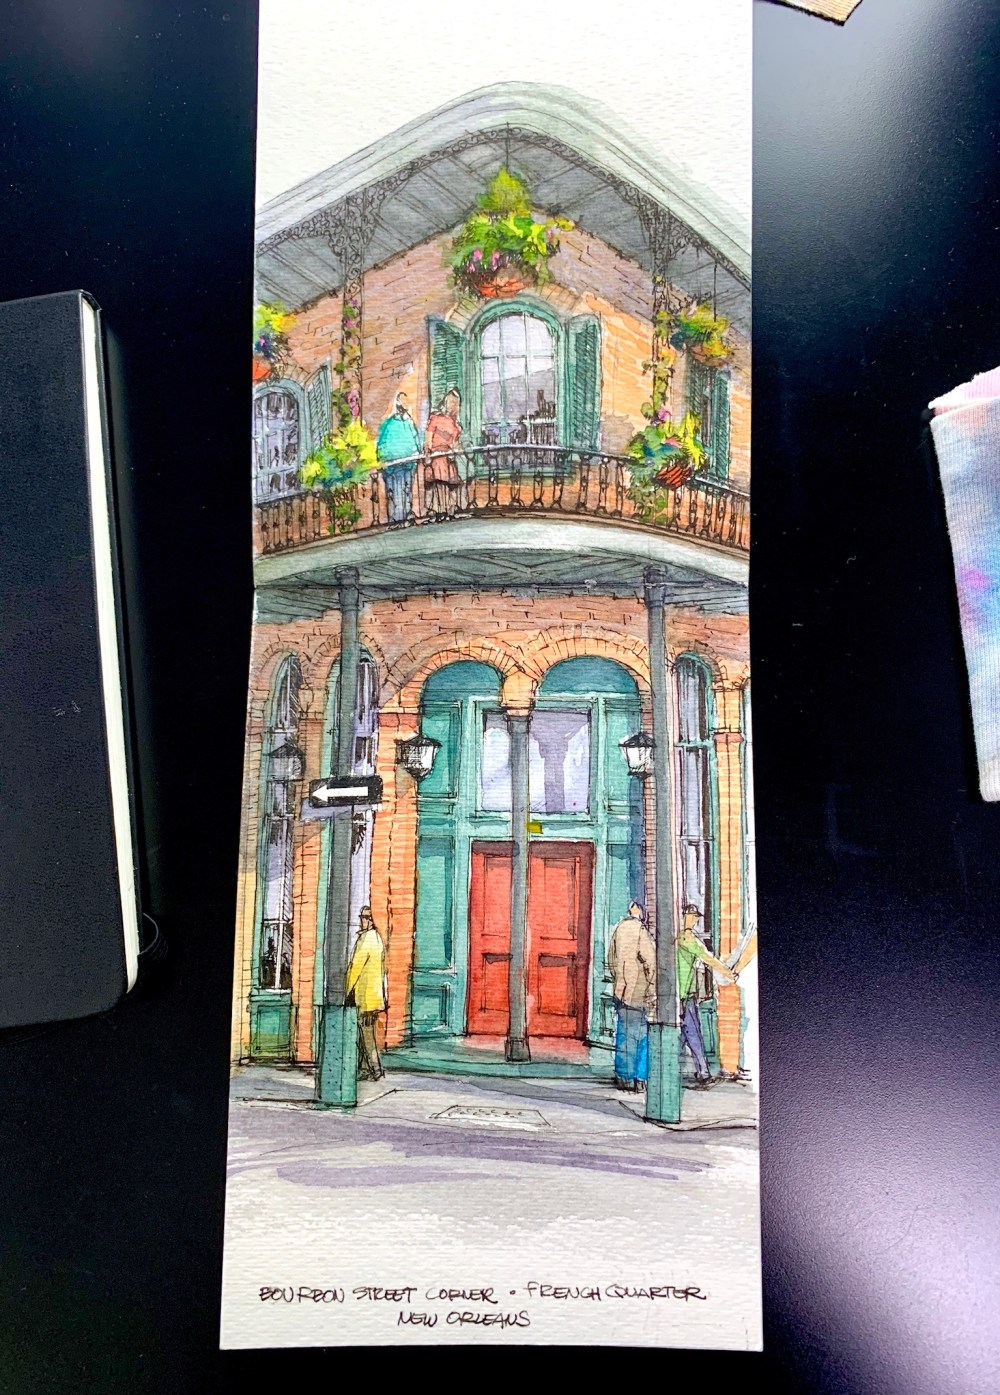 Strathmore Sketchbook over black desk. Brick building with red door watercolor and ink sketch